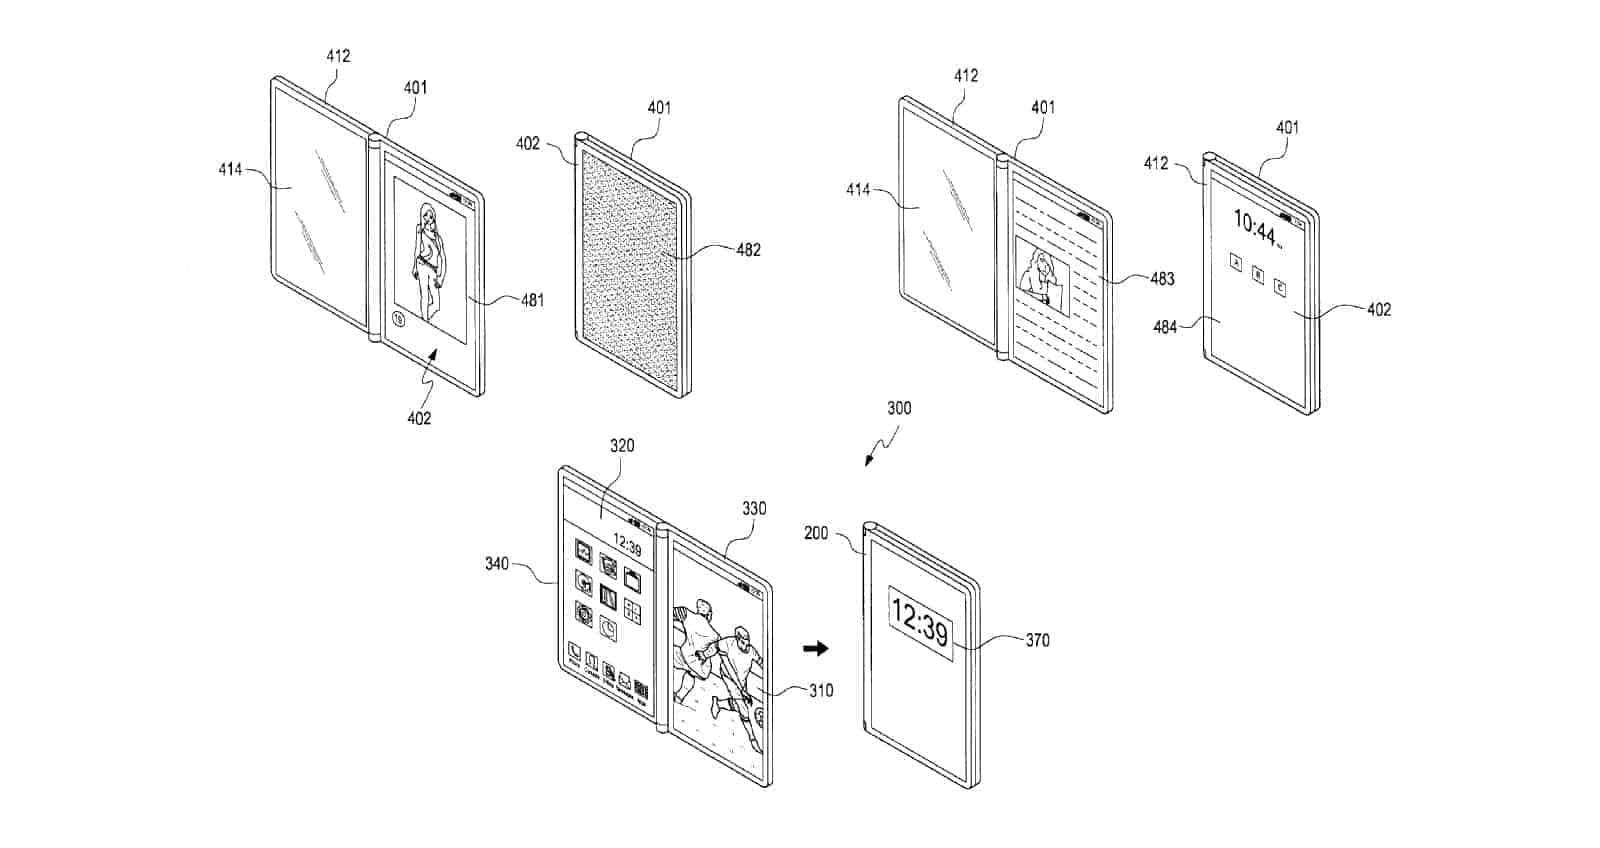 Samsung Exploring Triple-Screen Foldable Phone Designs